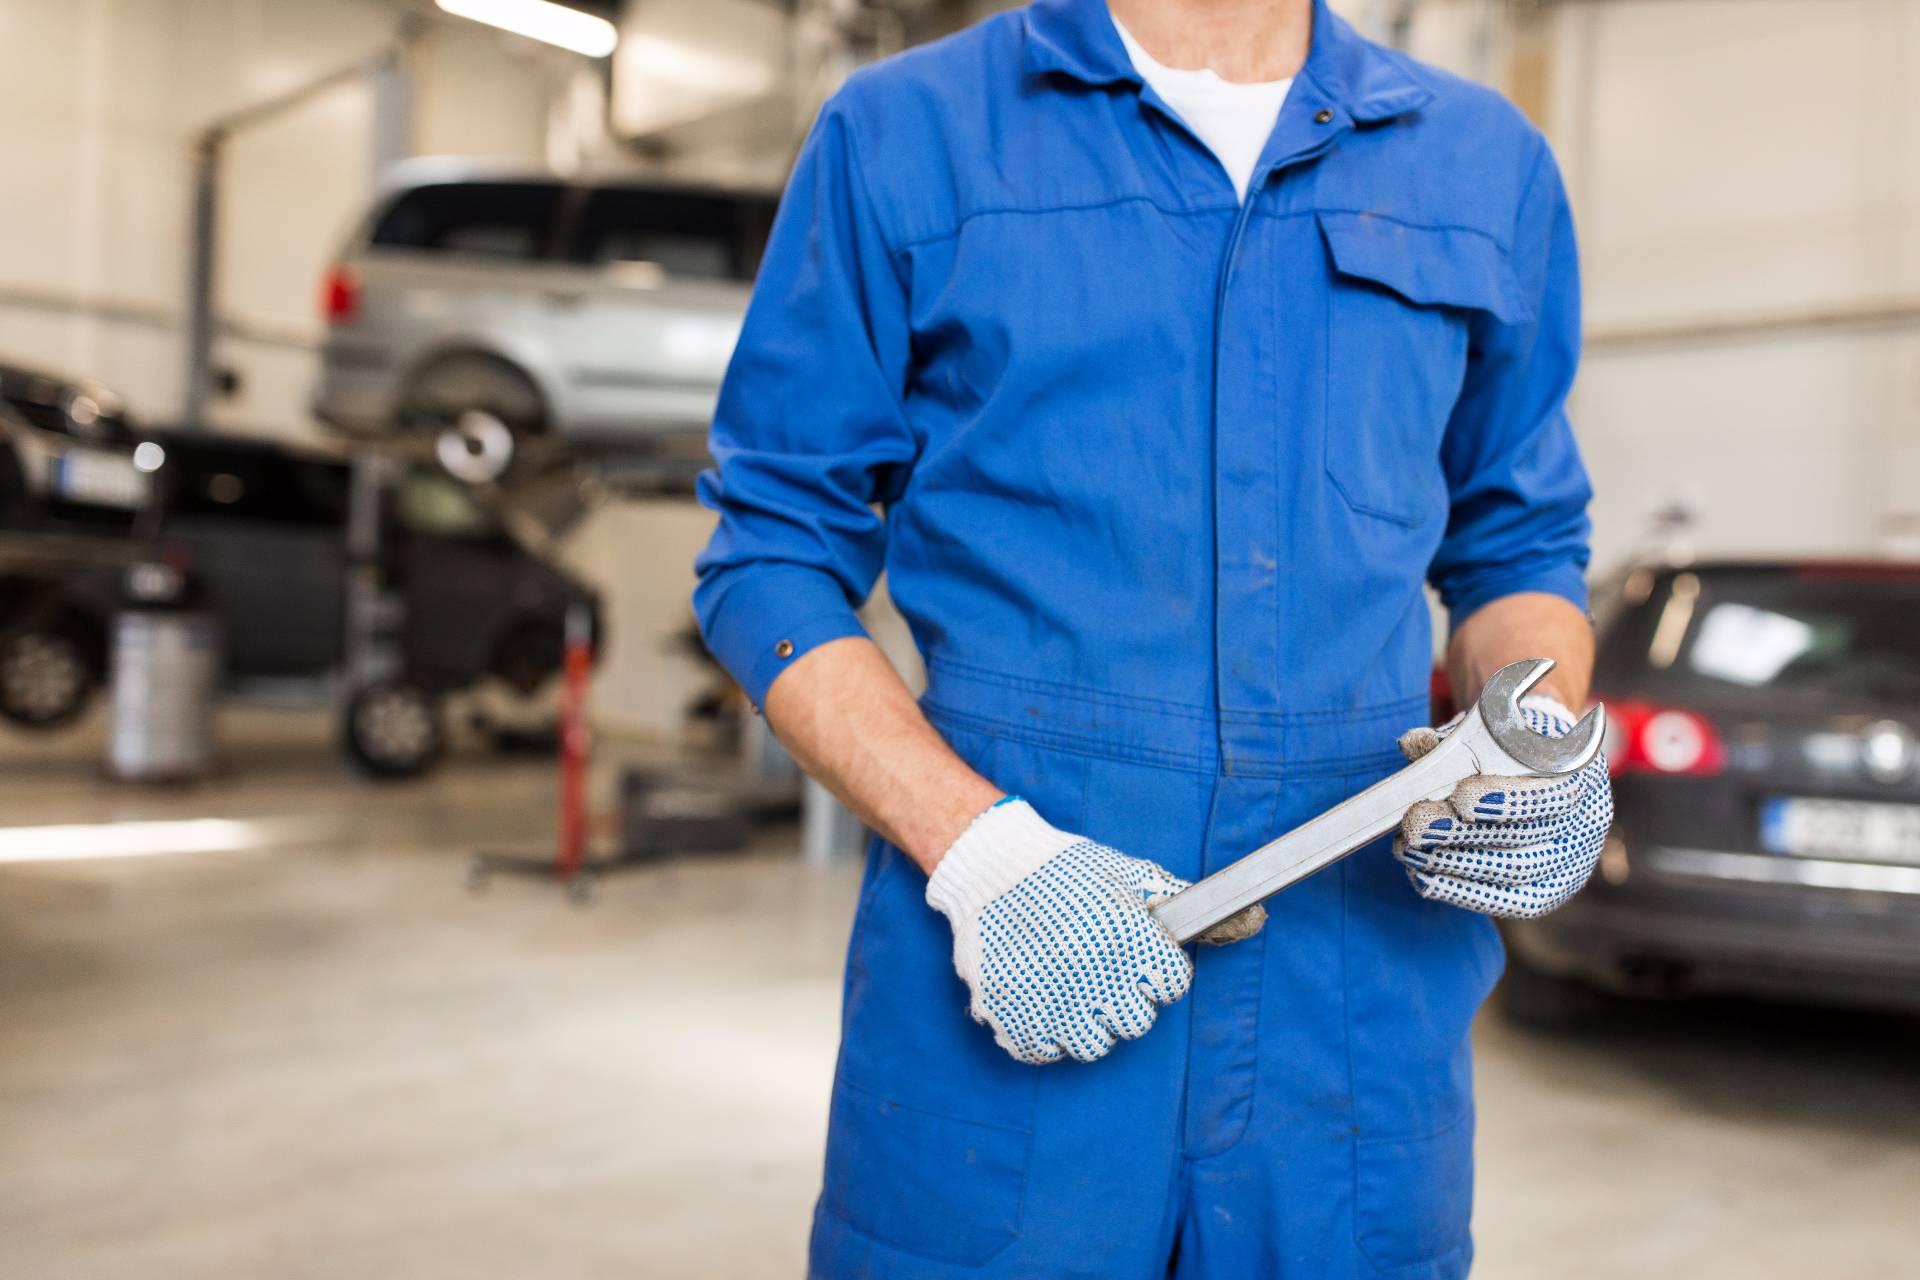 Colaraboración entre talleres de automóviles